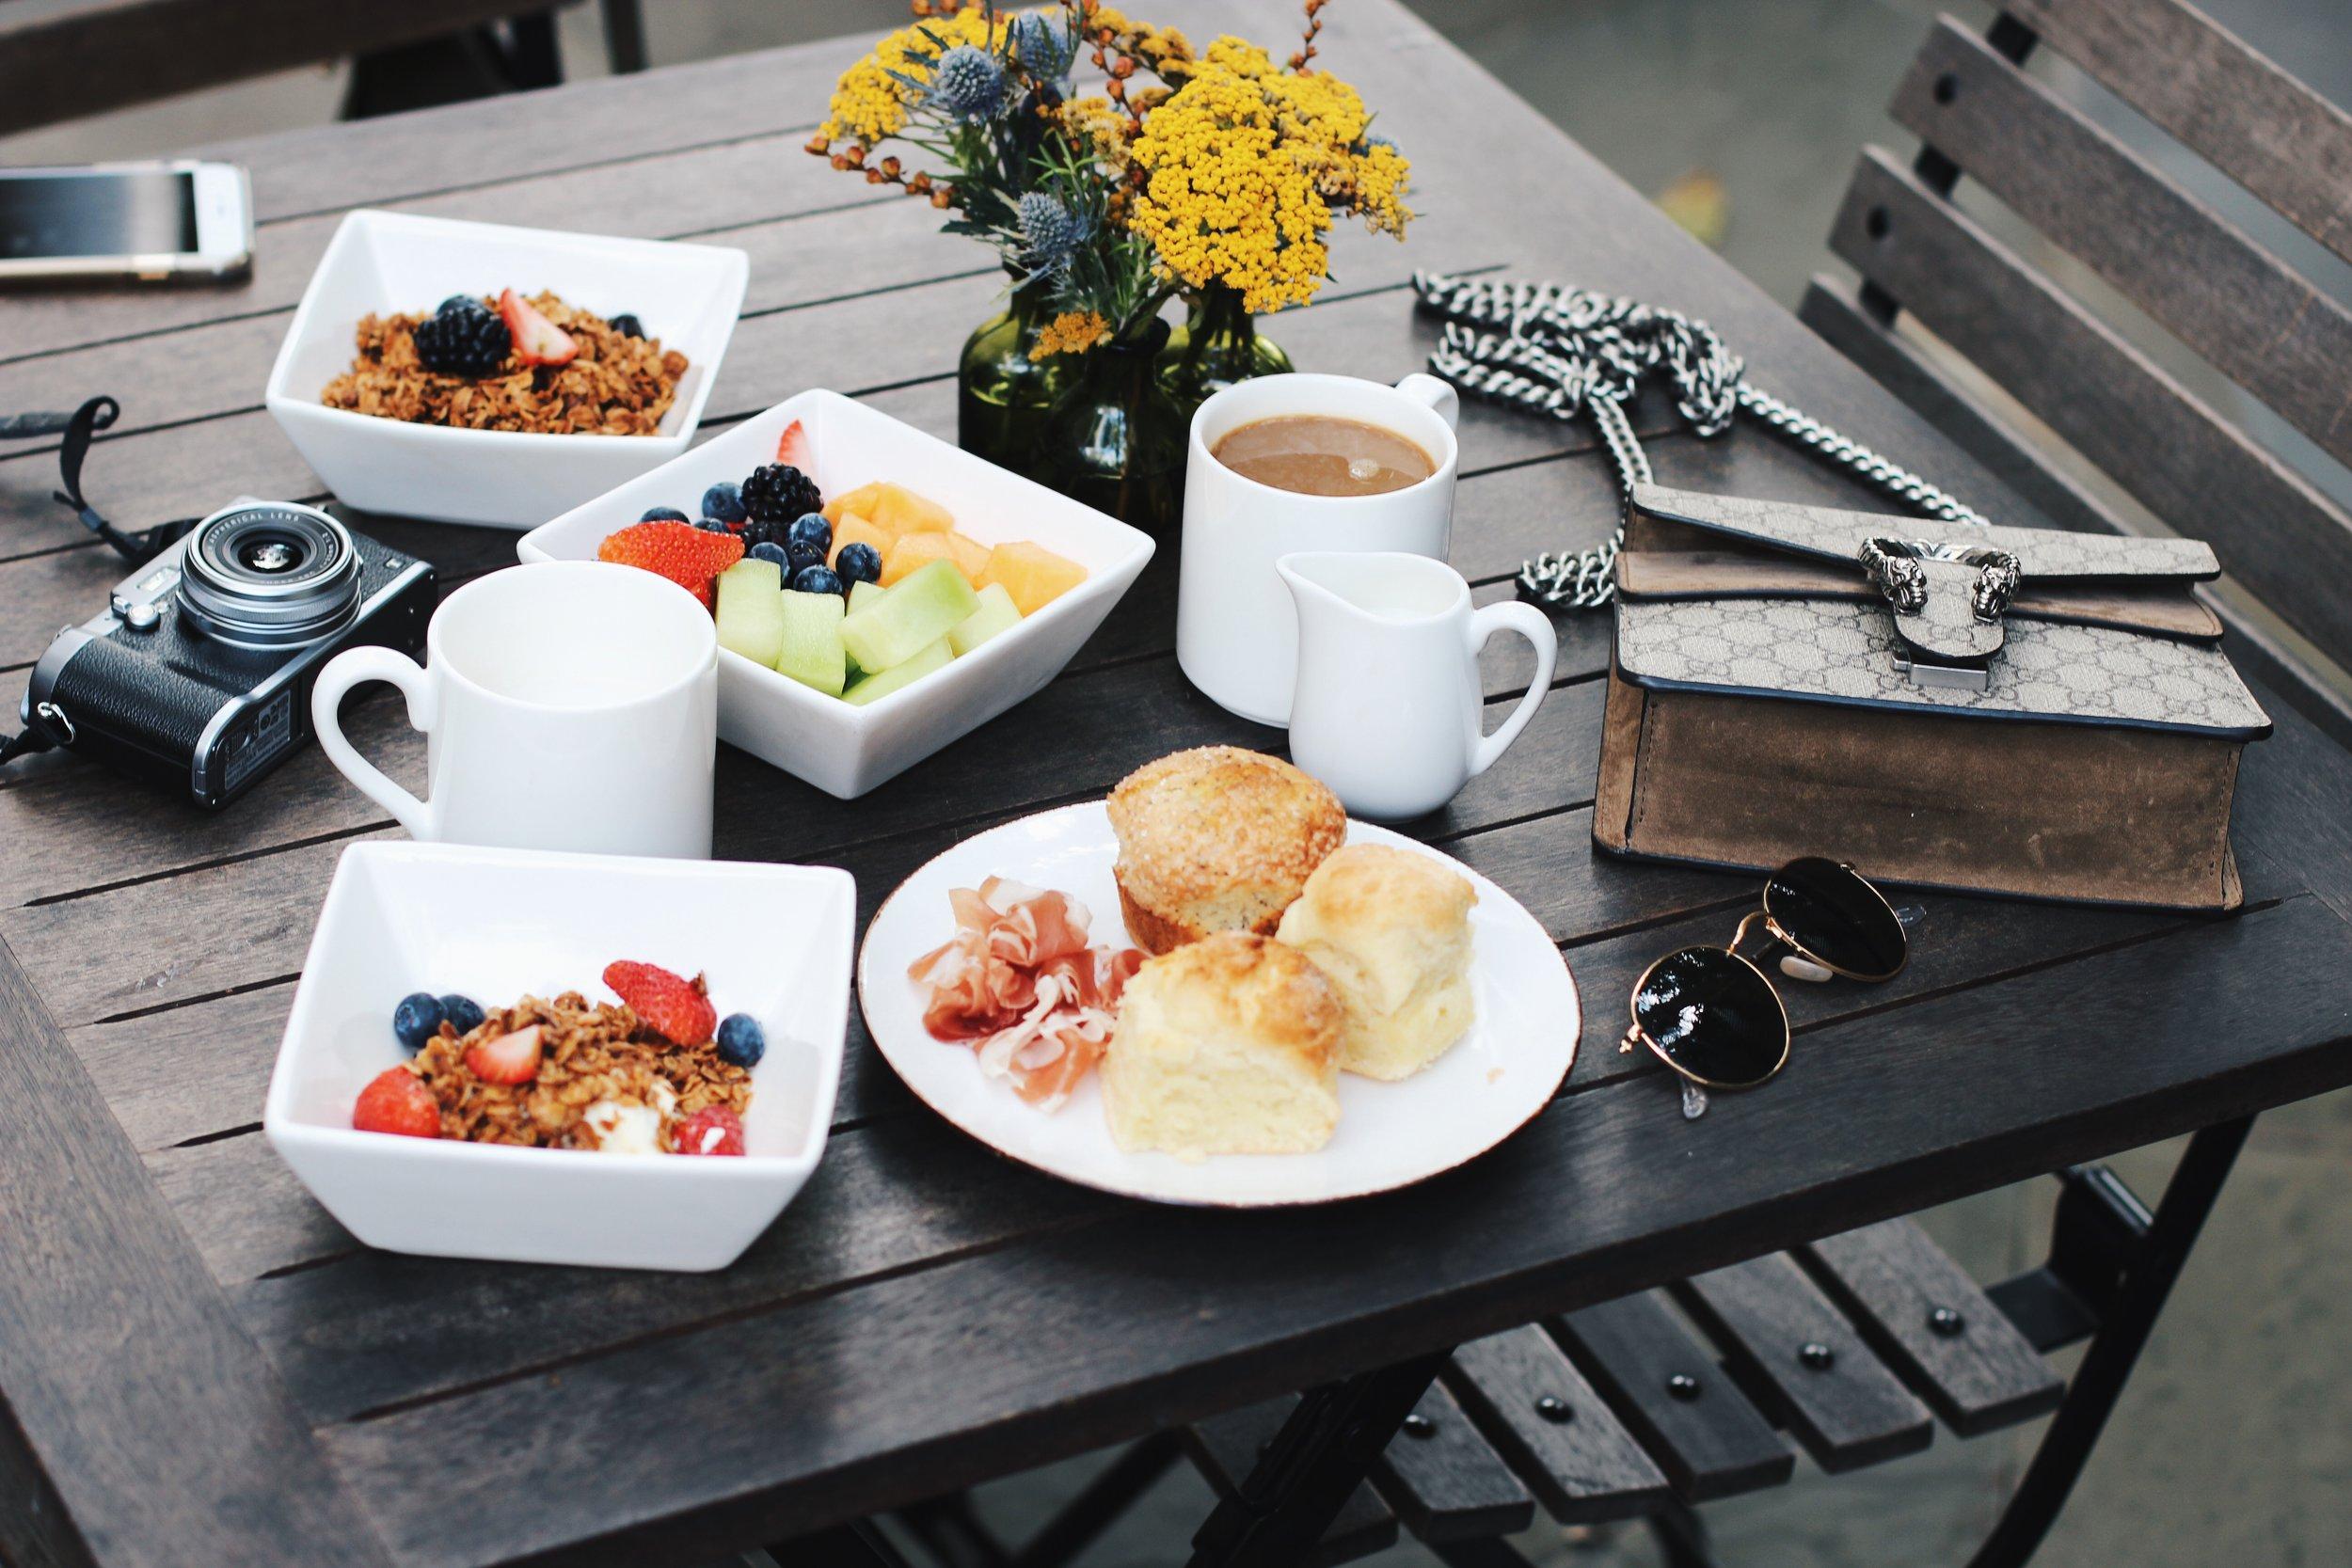 Breakfast at the Zero George Hotel by Julia Friedman in Charleston, South Carolina.